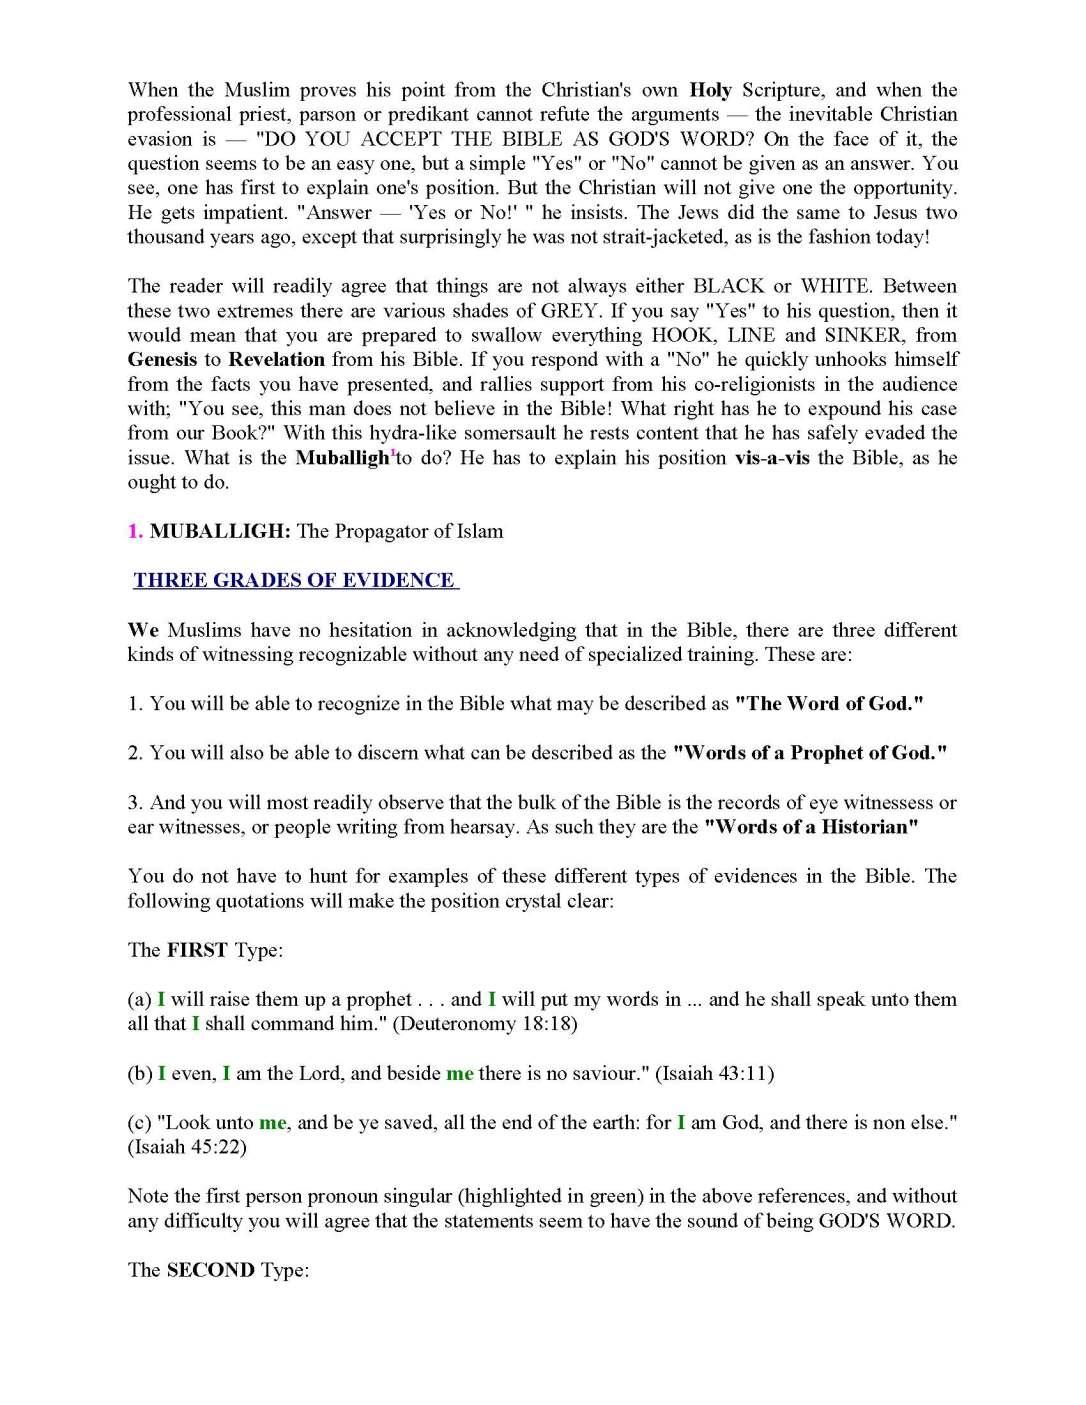 Is The Bible Gods Word [deedat]_Page_03